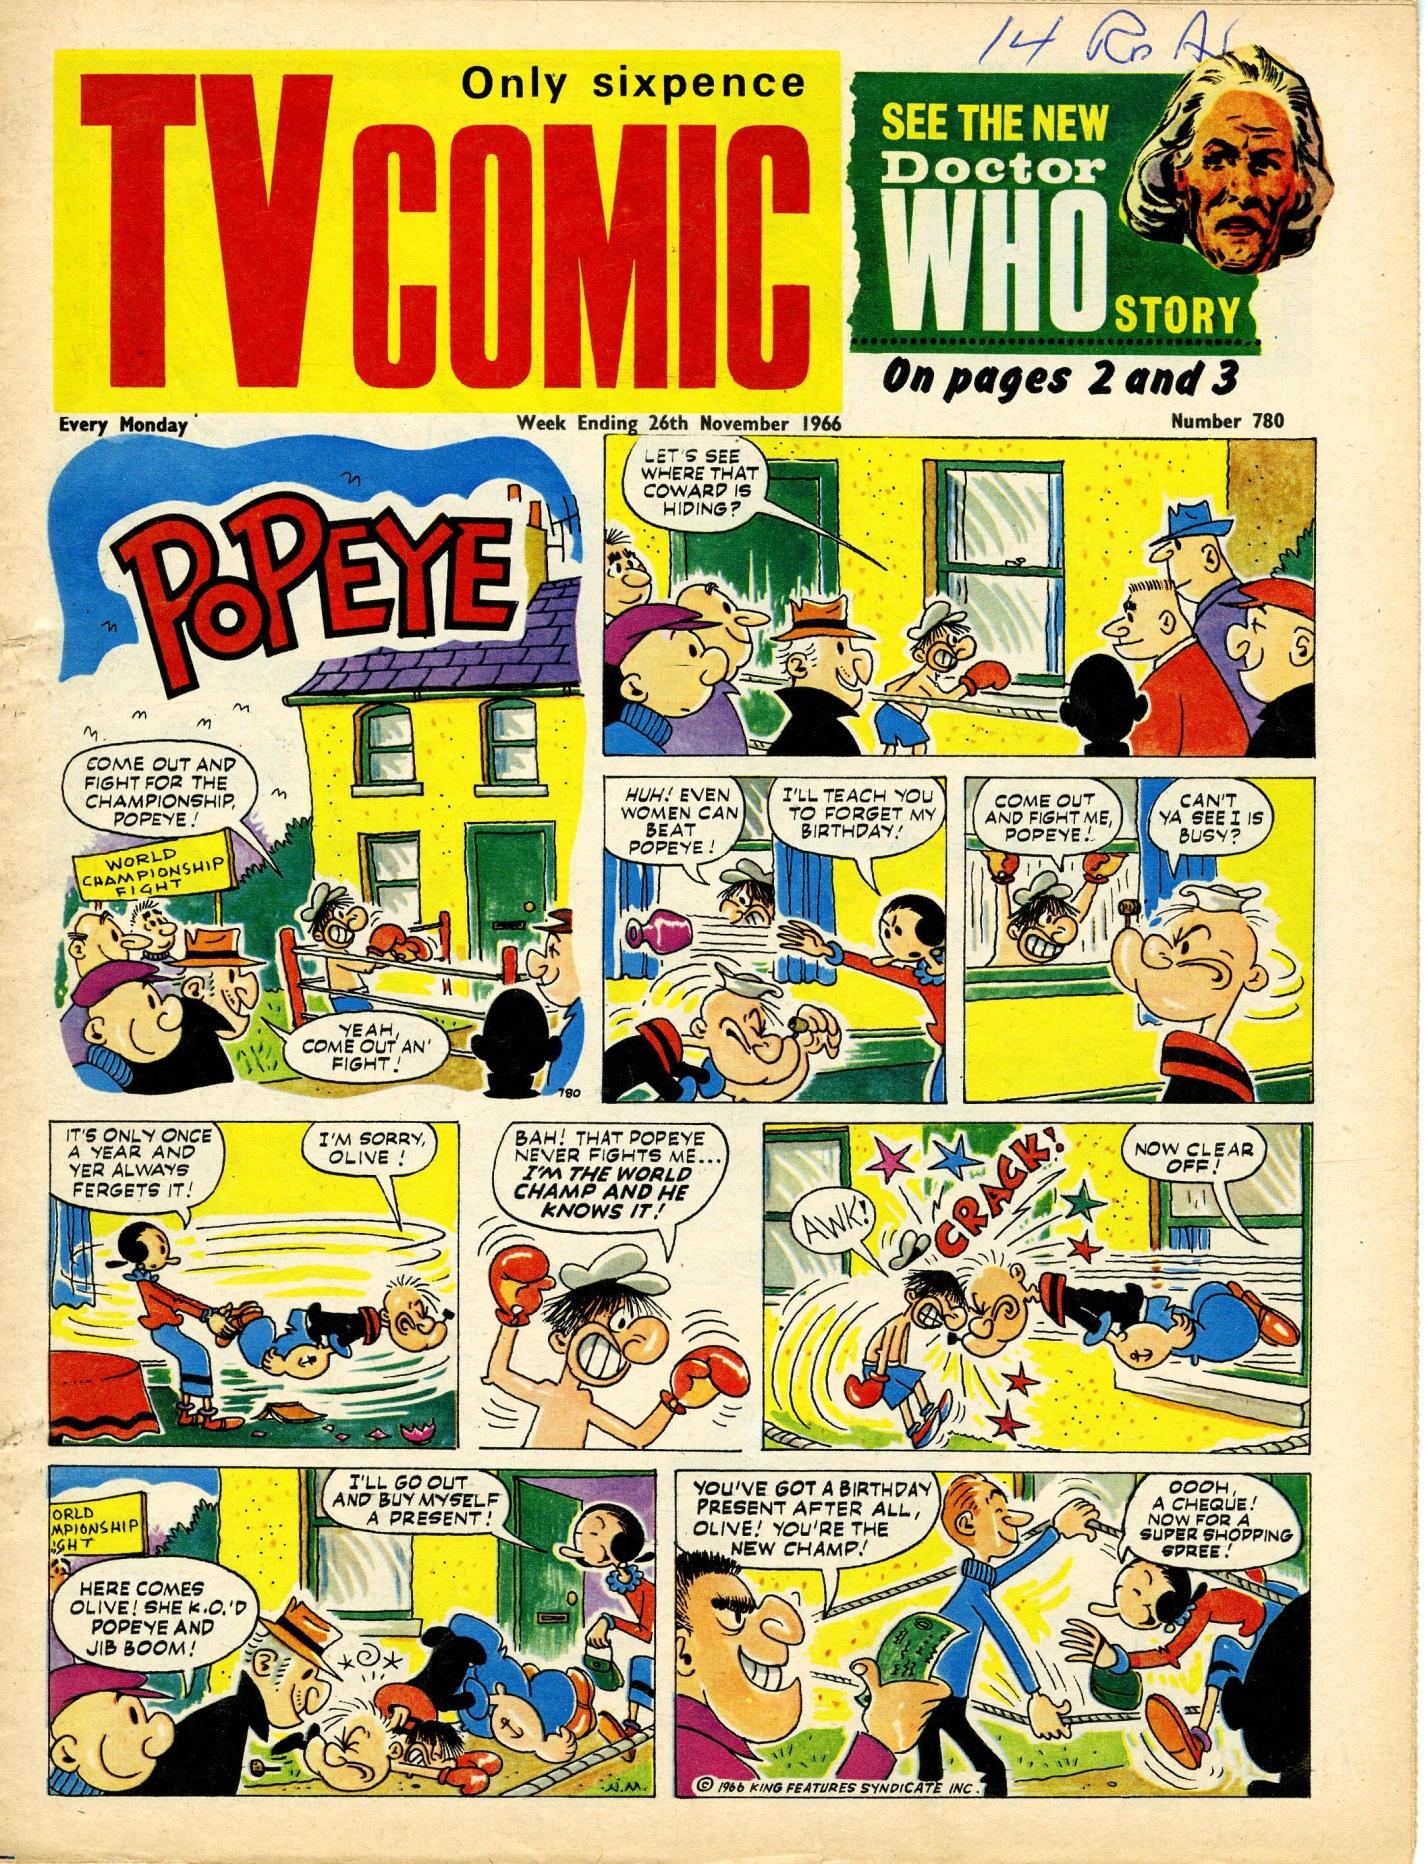 TV Comic, no. 780, 26 November 1966